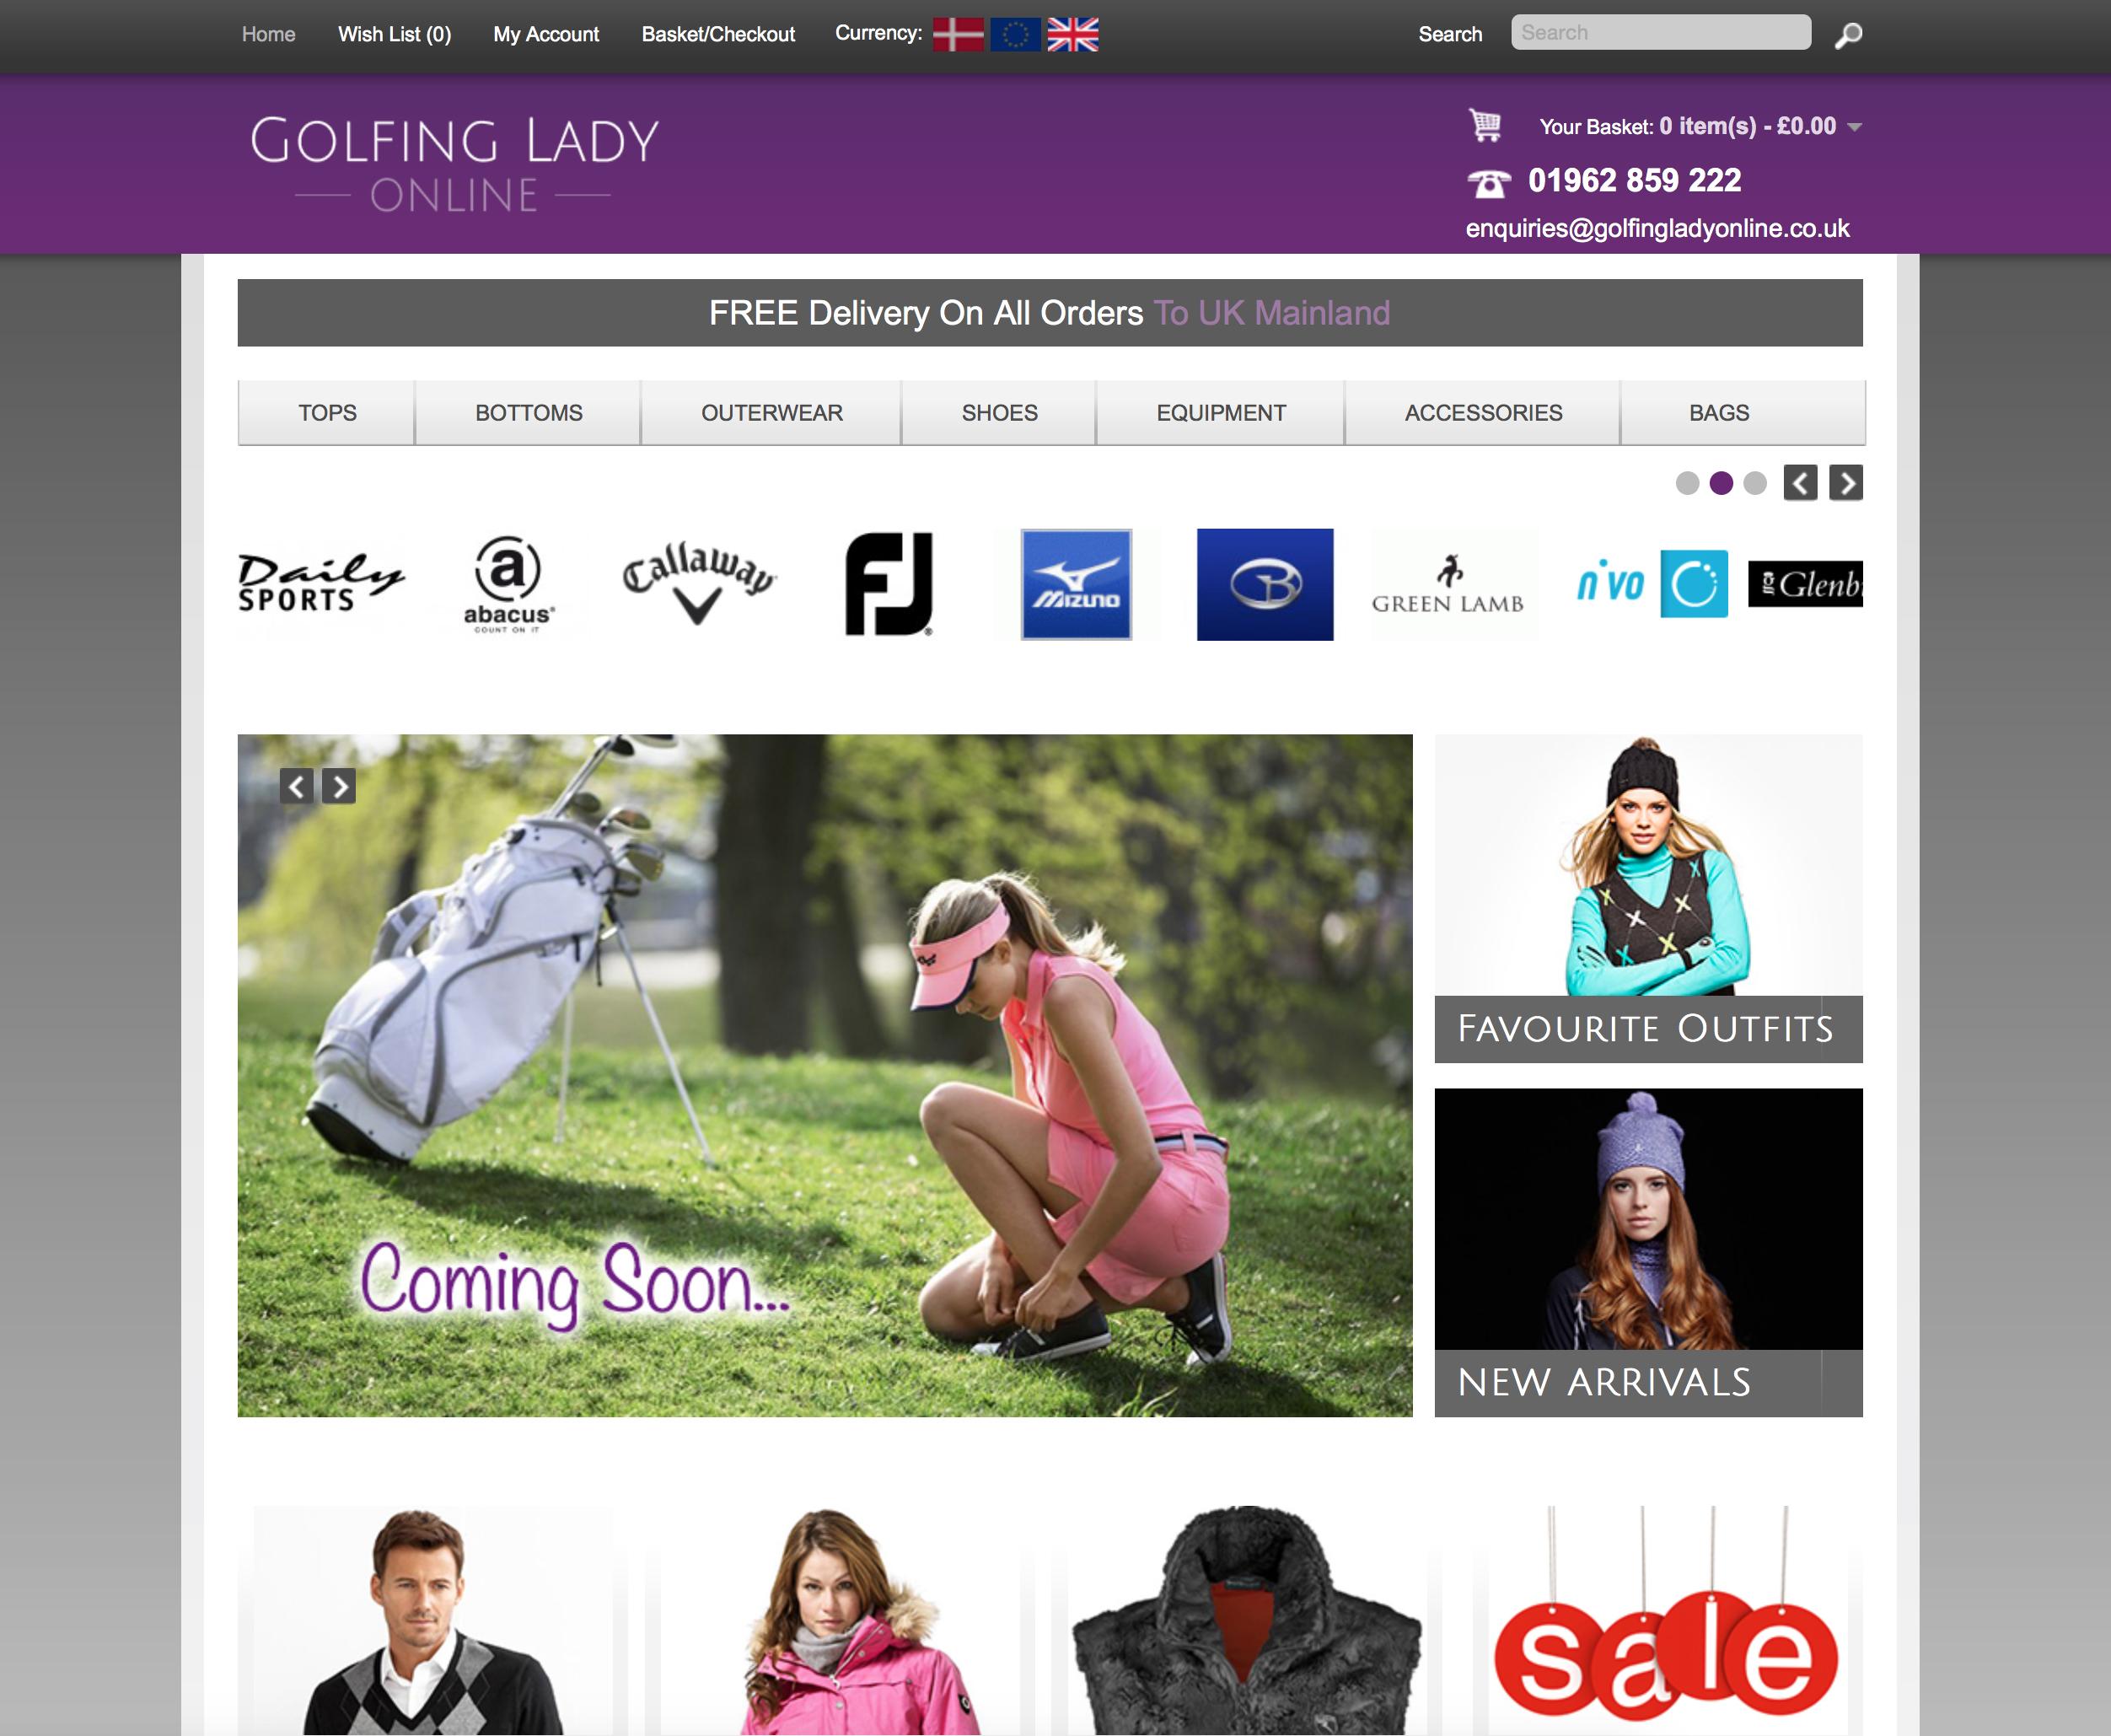 golfing-lady-online-website